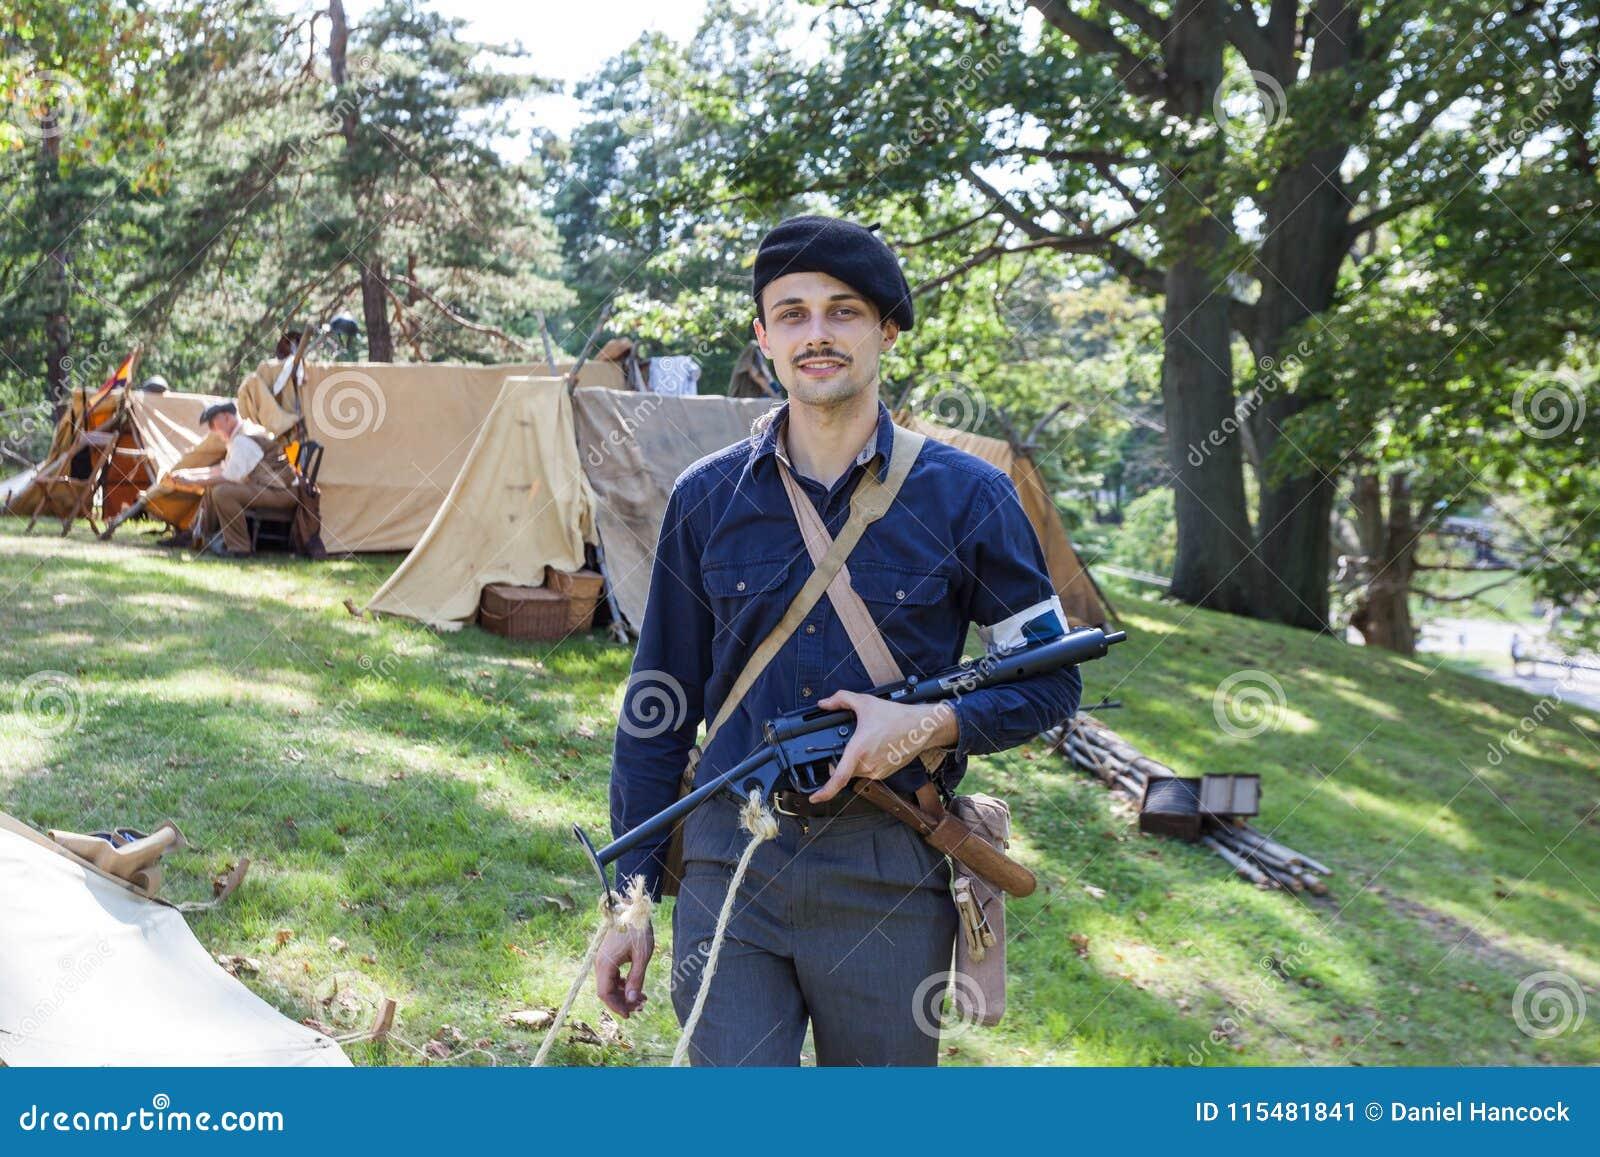 French Resistance Fighter With Vintage Sten Gun Editorial